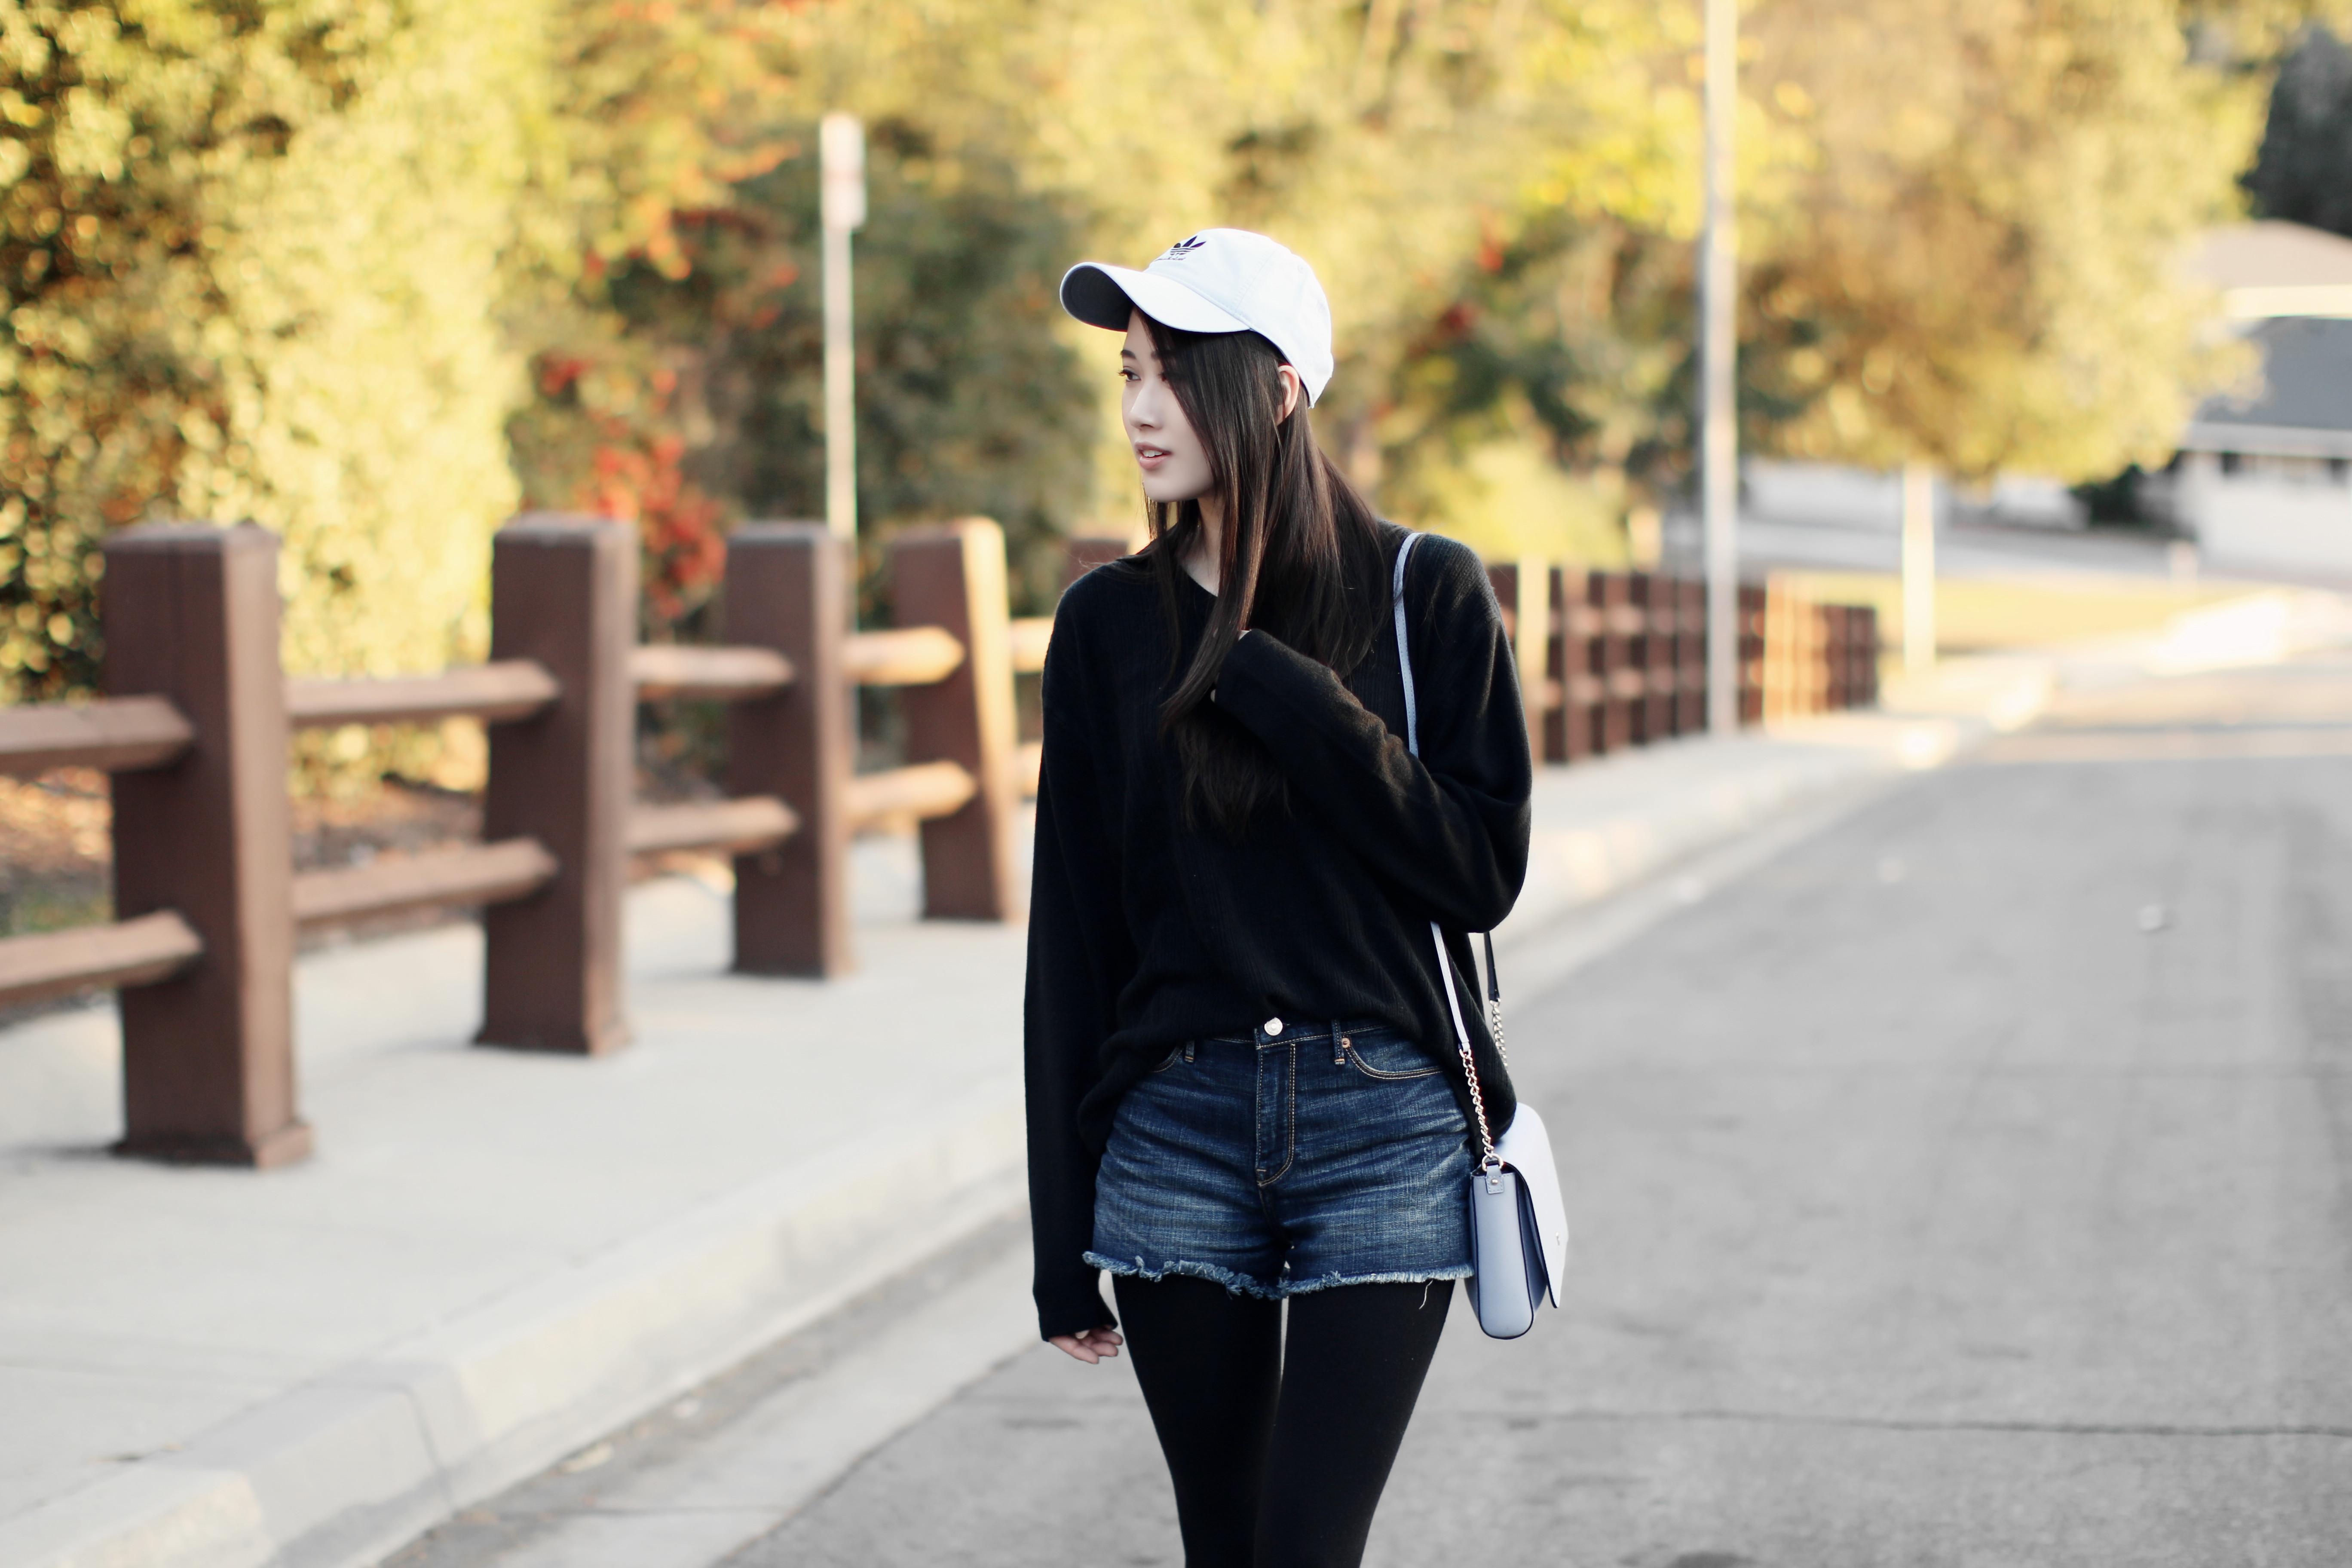 4362-ootd-fashion-style-outfitoftheday-wiwt-streetstyle-adidas-urbanoutfitters-hm-f21xme-nike-elizabeeetht-clothestoyouuu